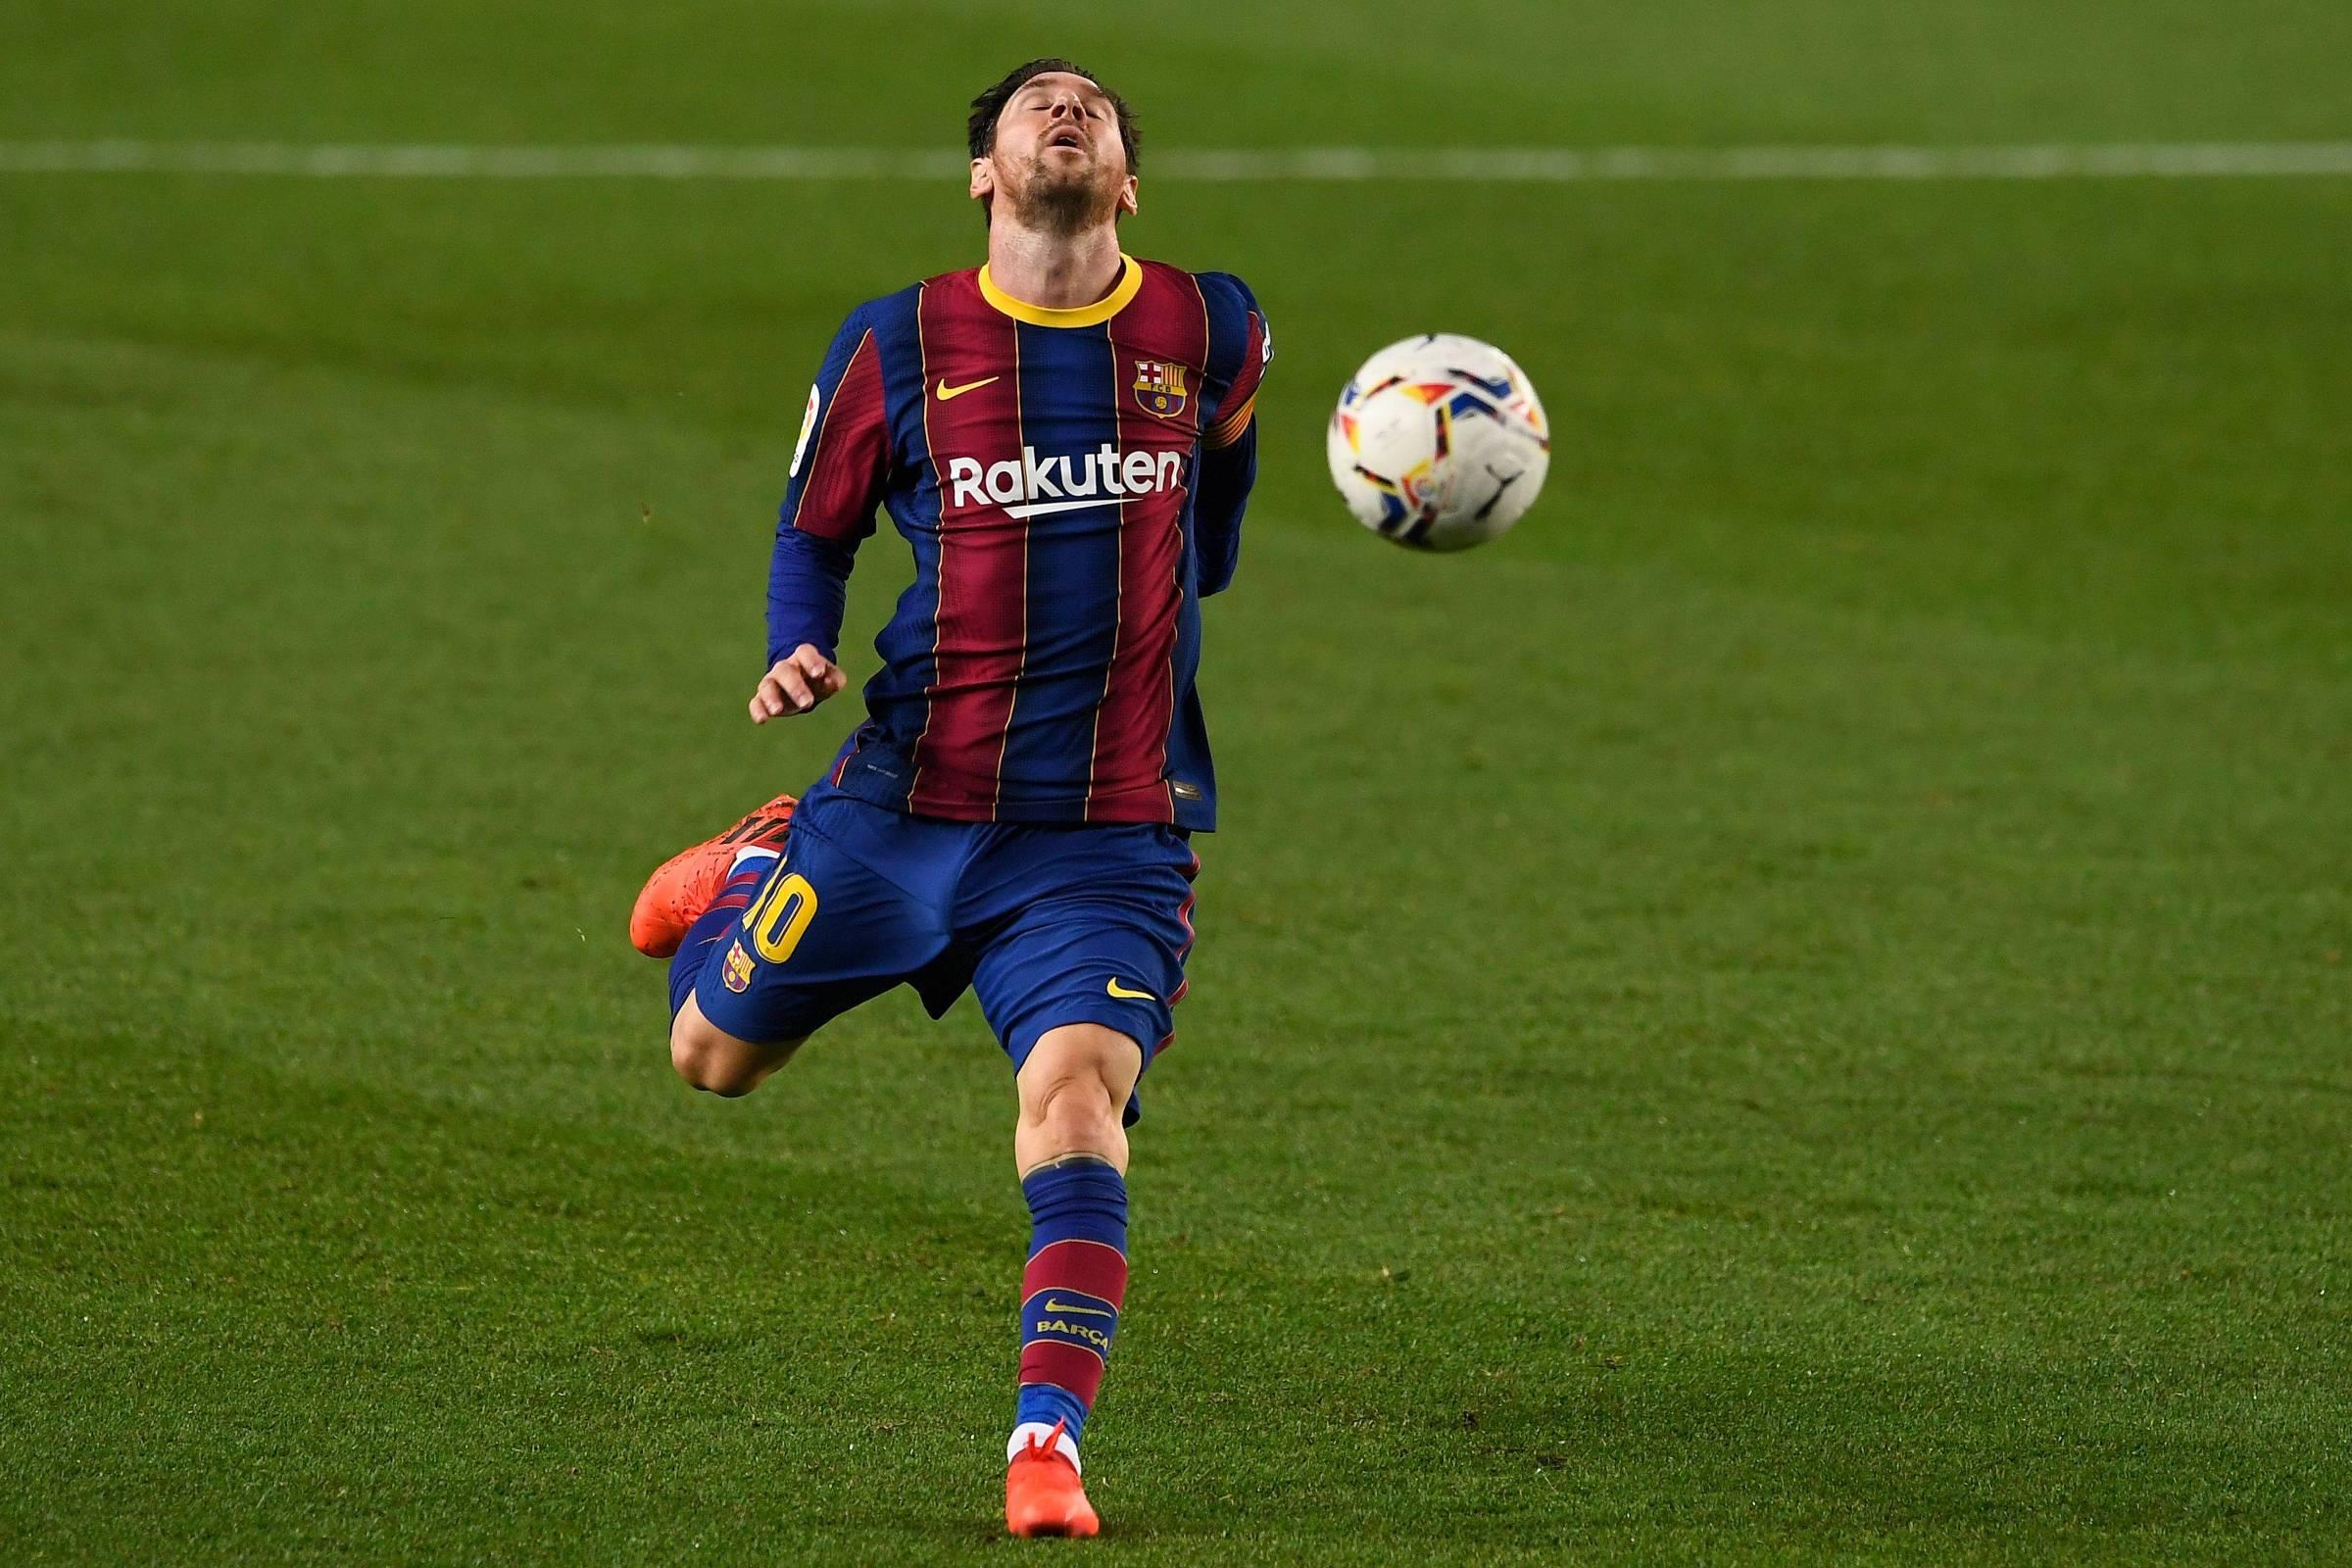 Como o Barcelona, clube com faturamento recorde, vive crise financeira